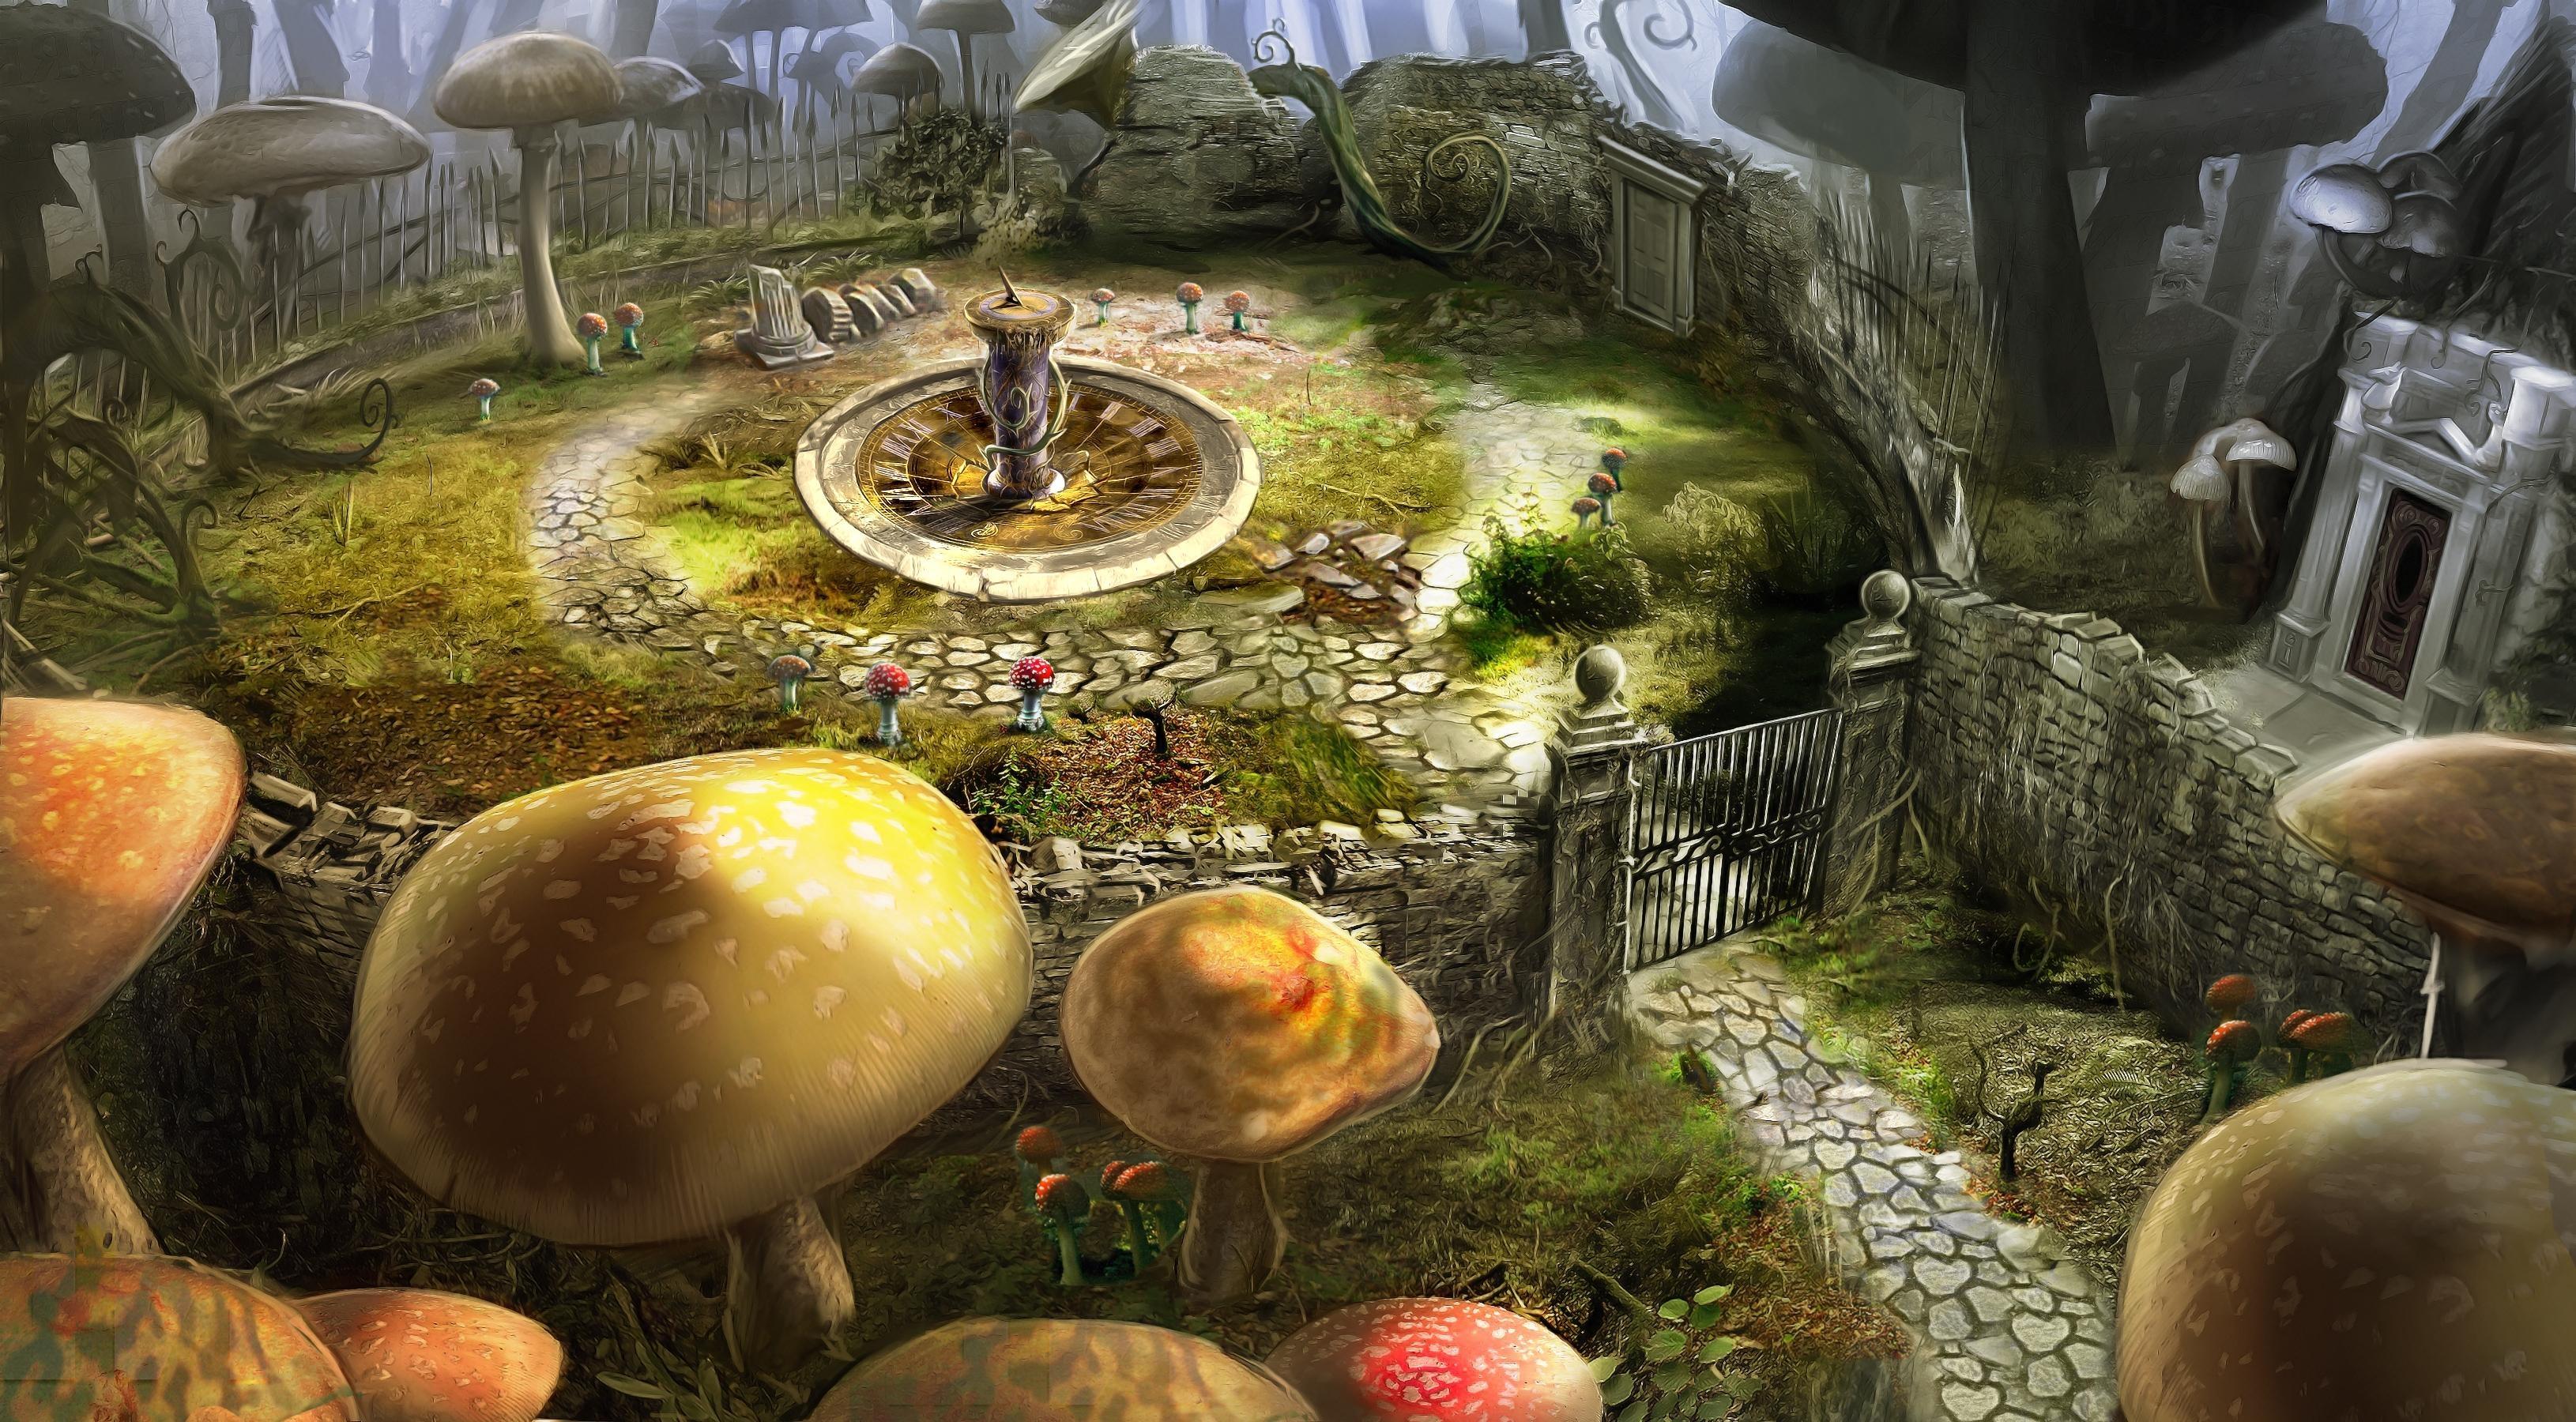 Alice in wonderland hd wallpaper background image 3260x1800 id 214361 wallpaper abyss - Free wallpaper alice in wonderland ...